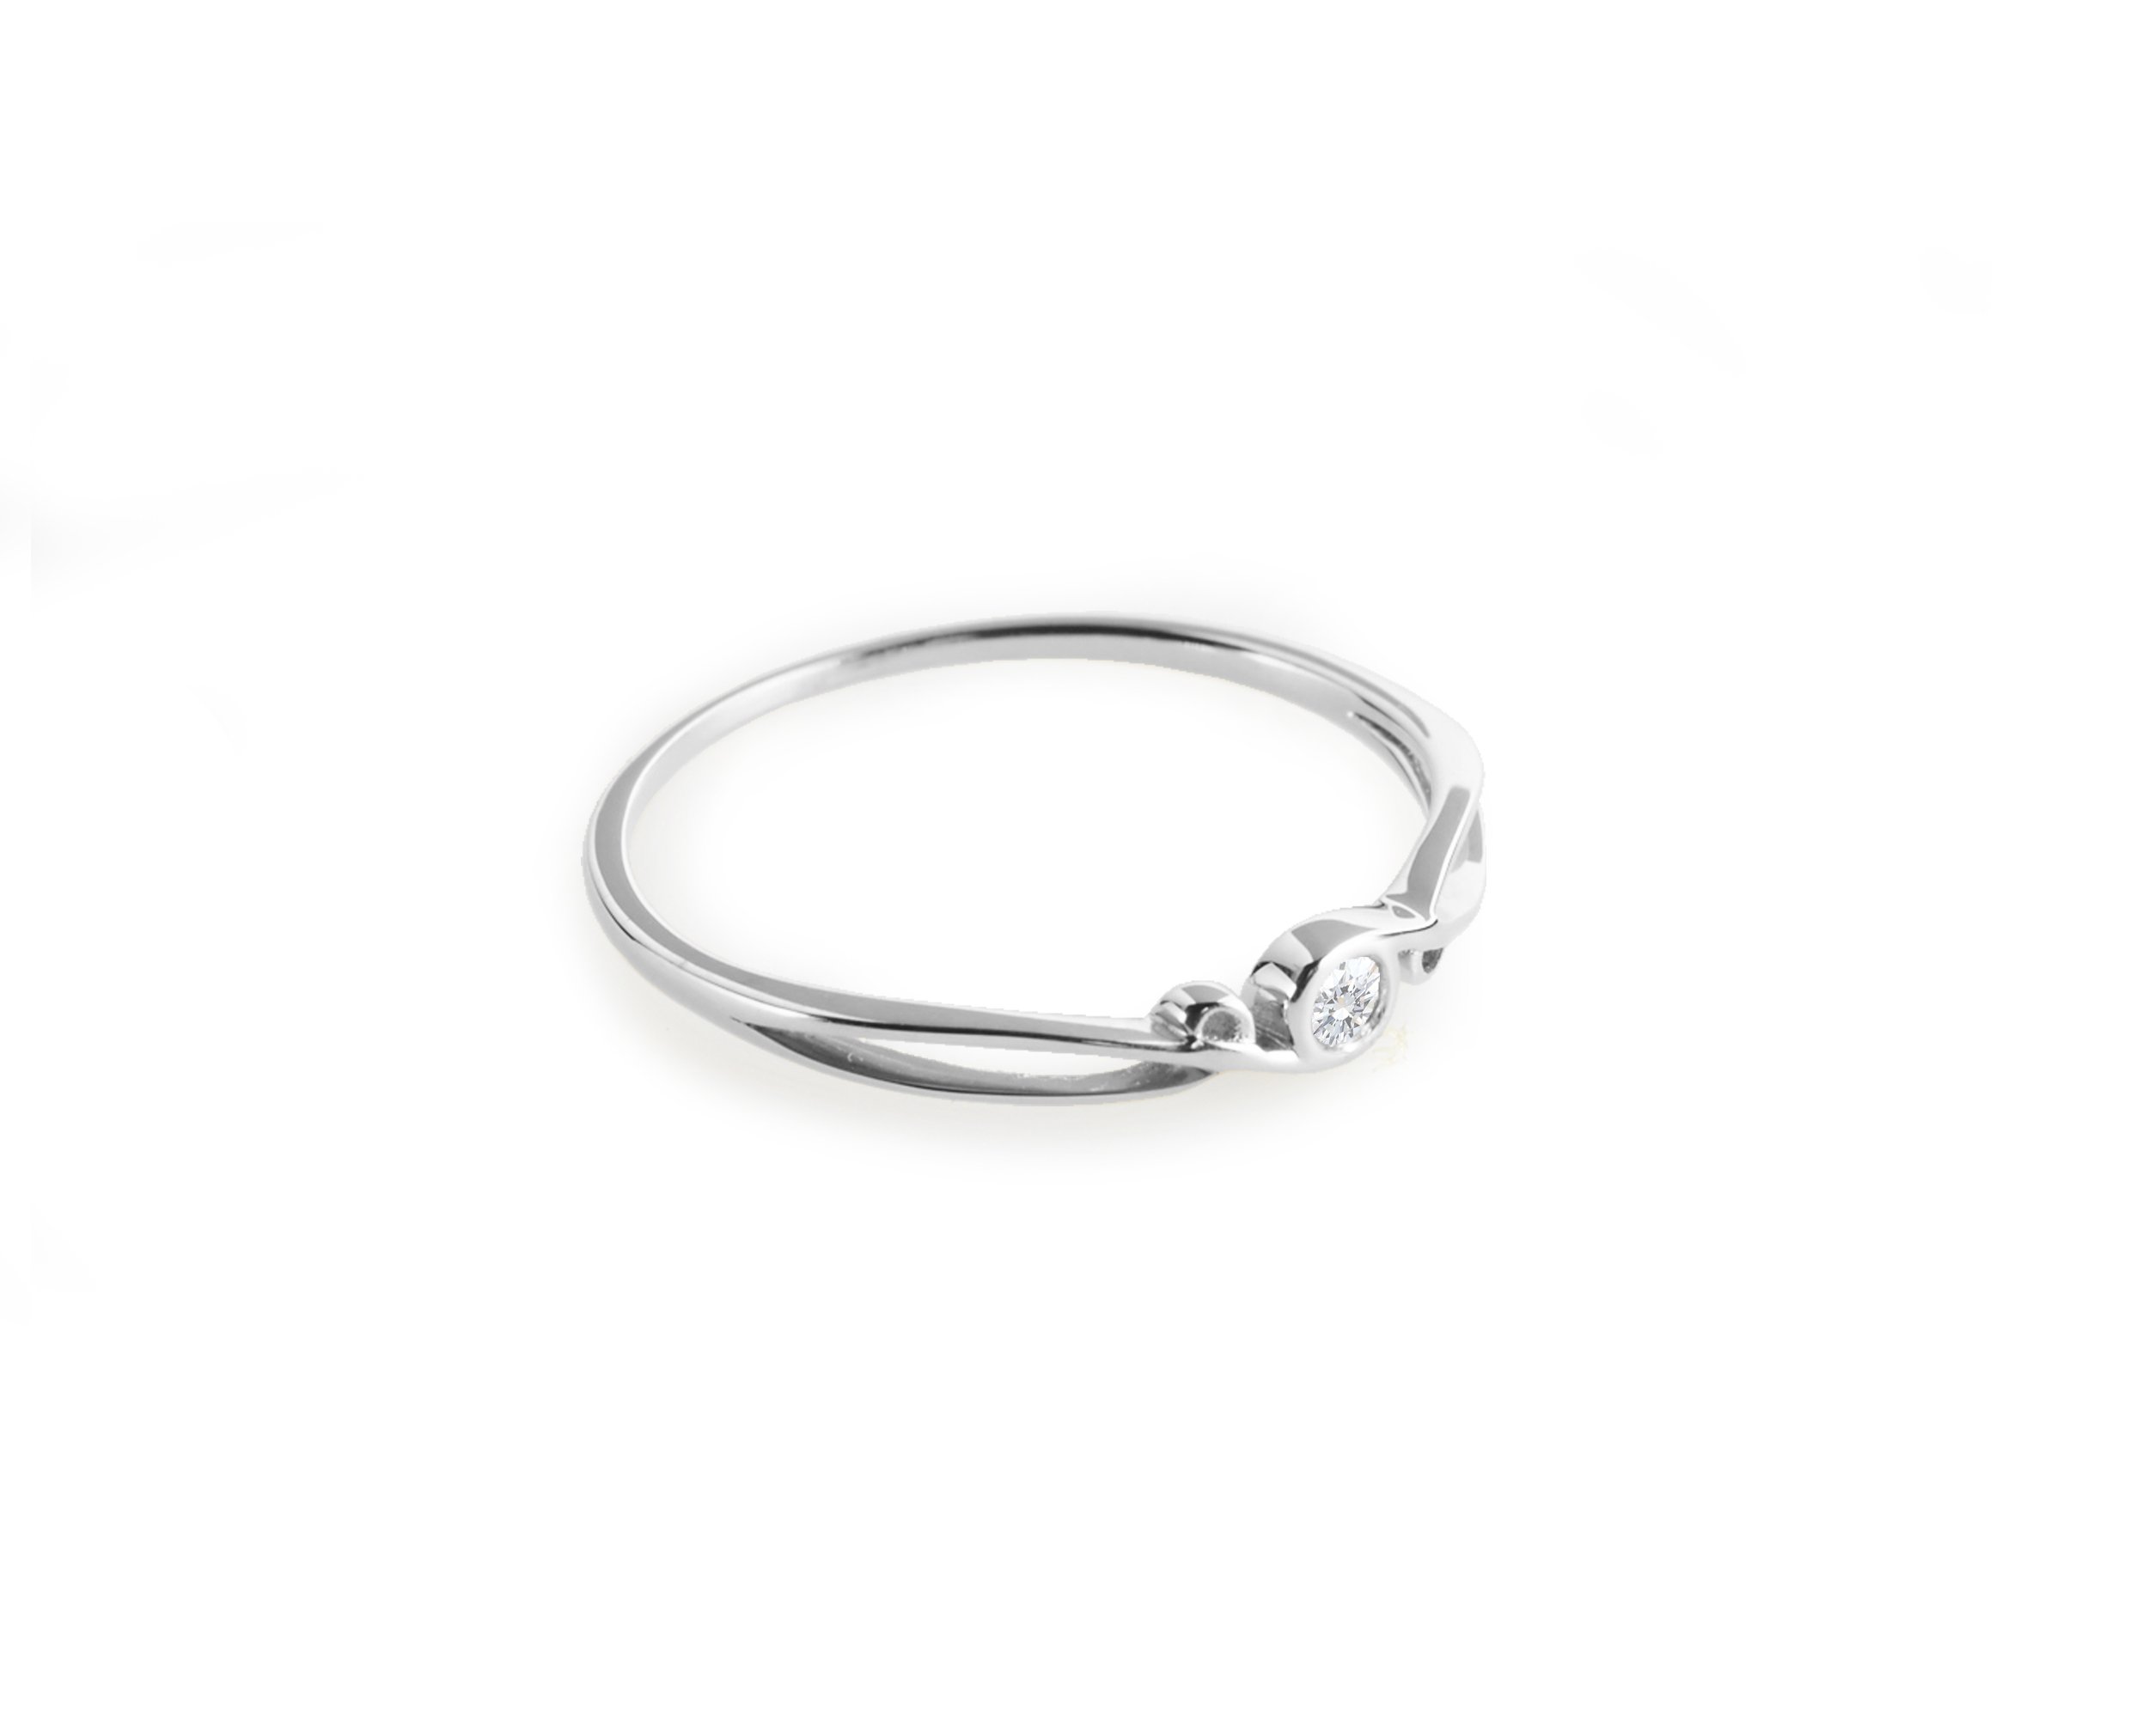 detail-1 - diamond + white gold.jpg